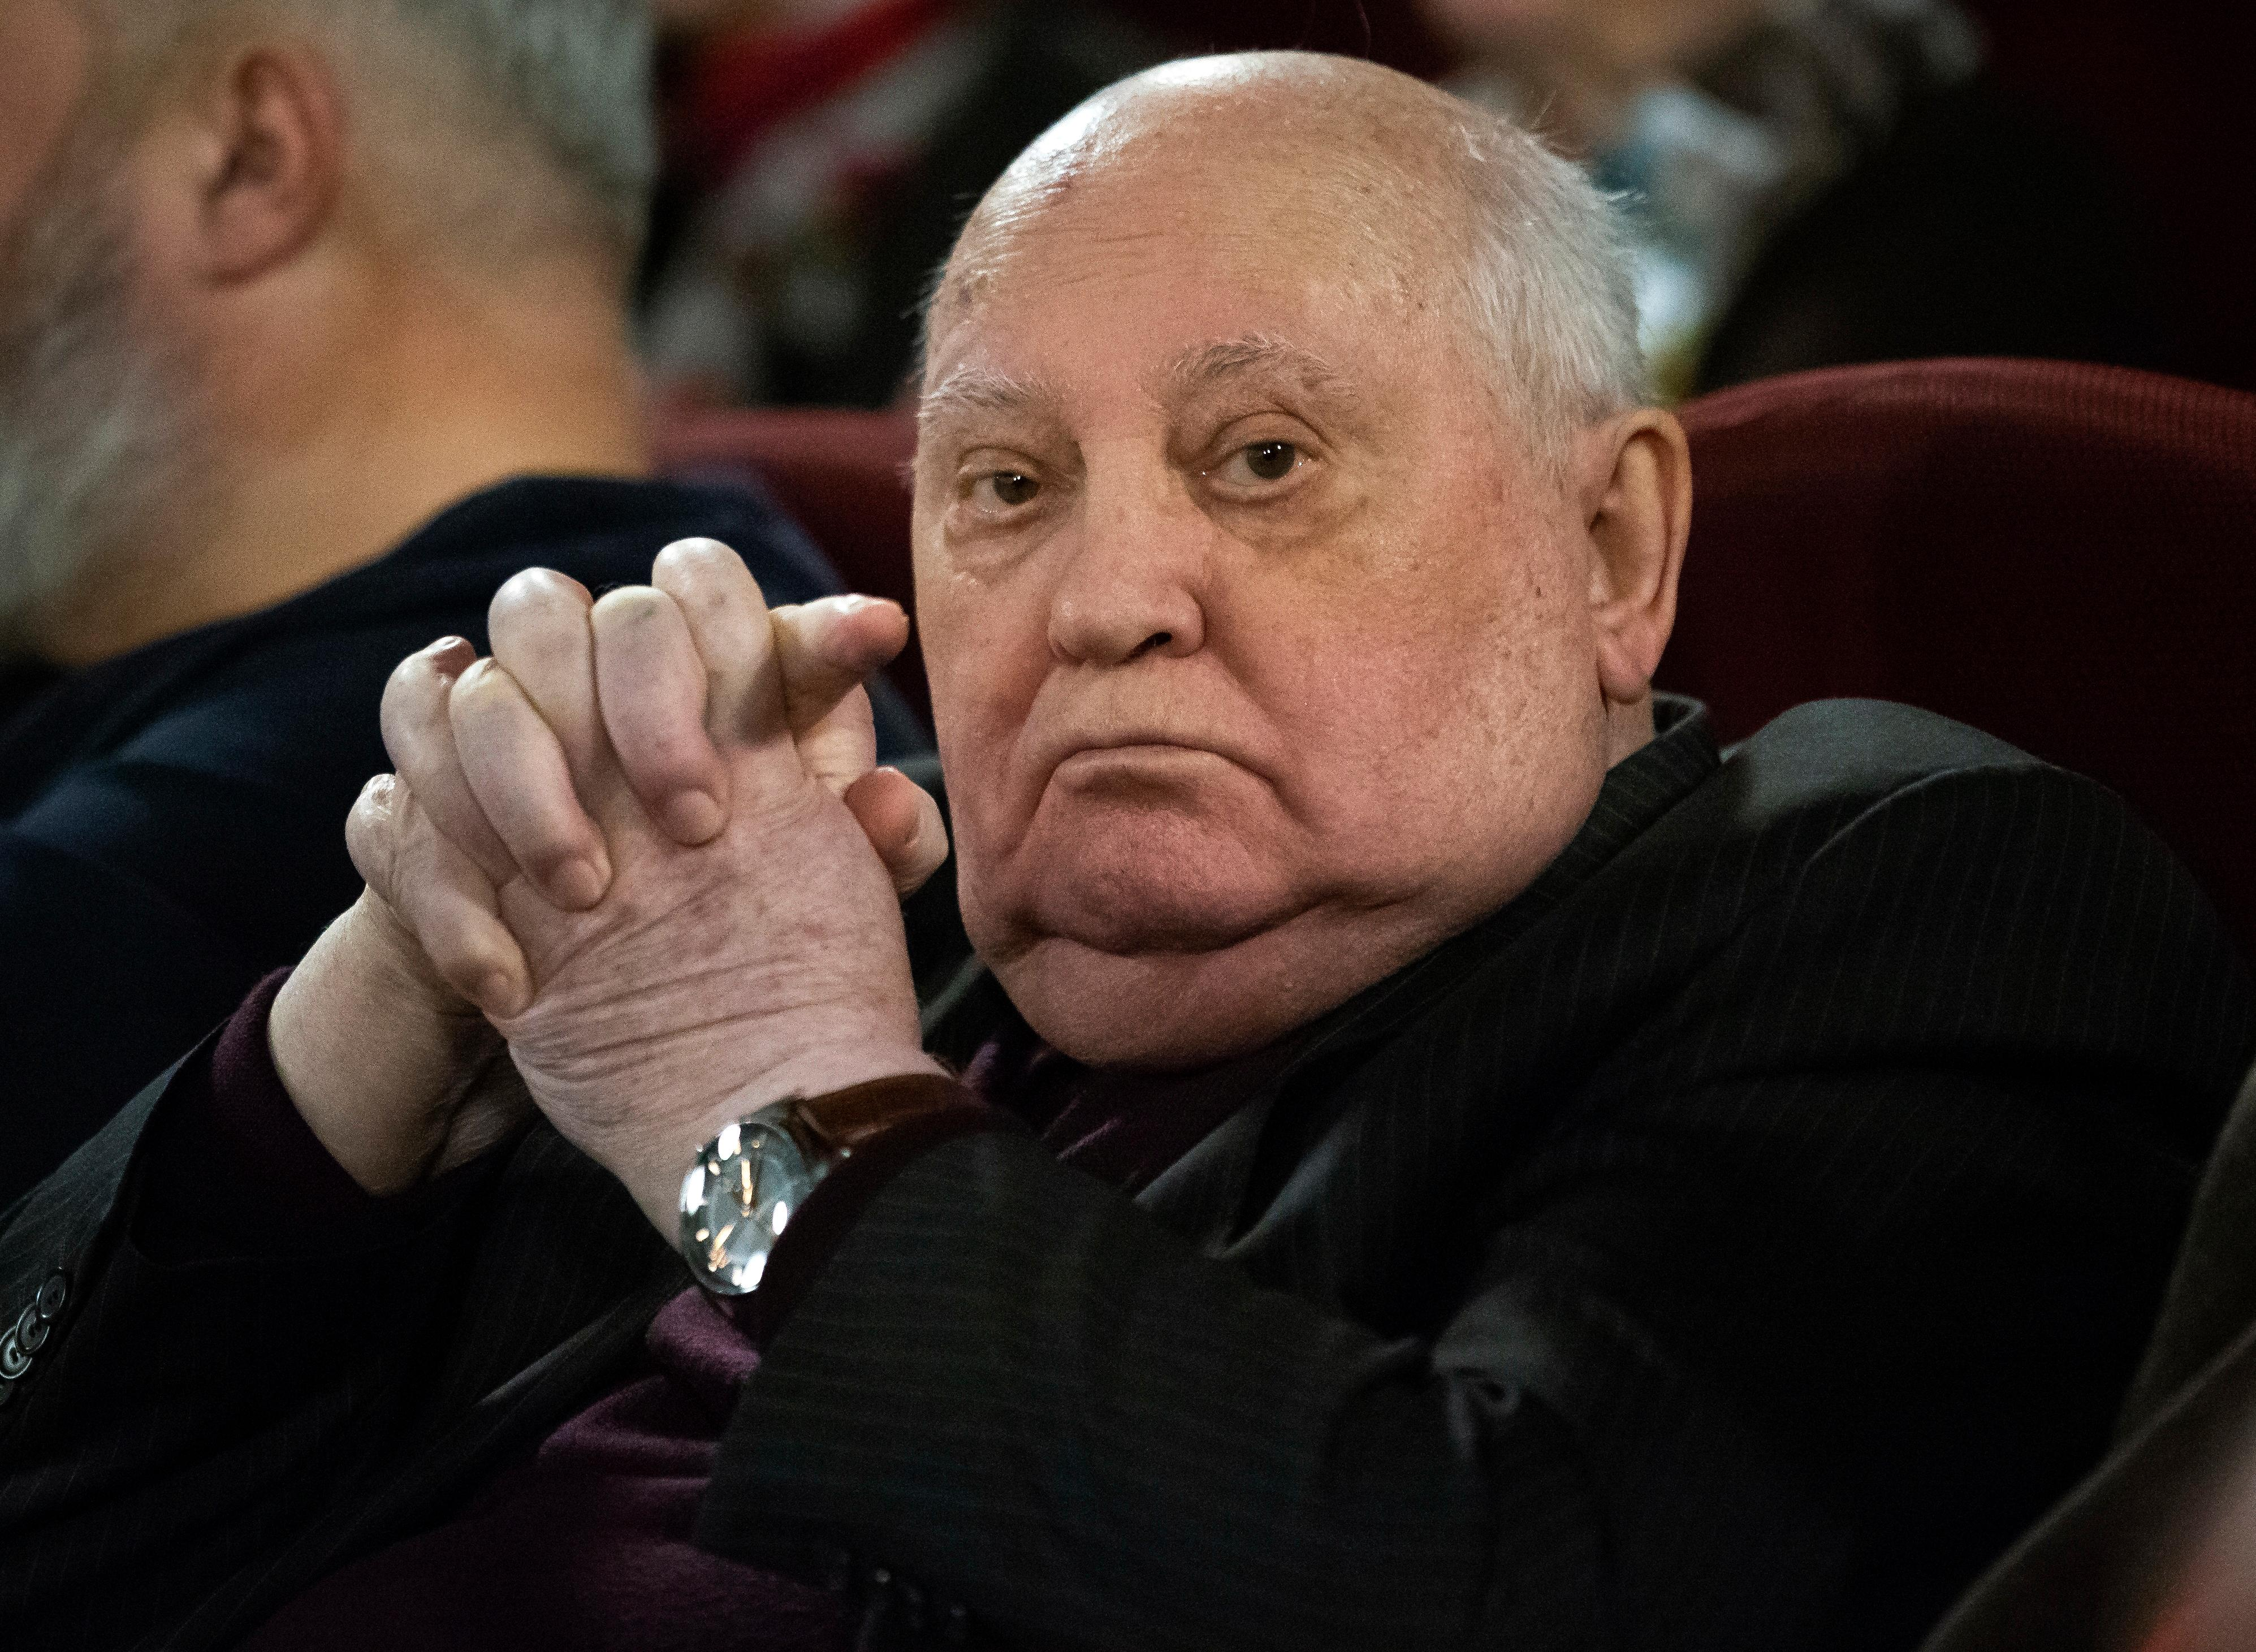 Горбачёв дал совет следующему президенту США